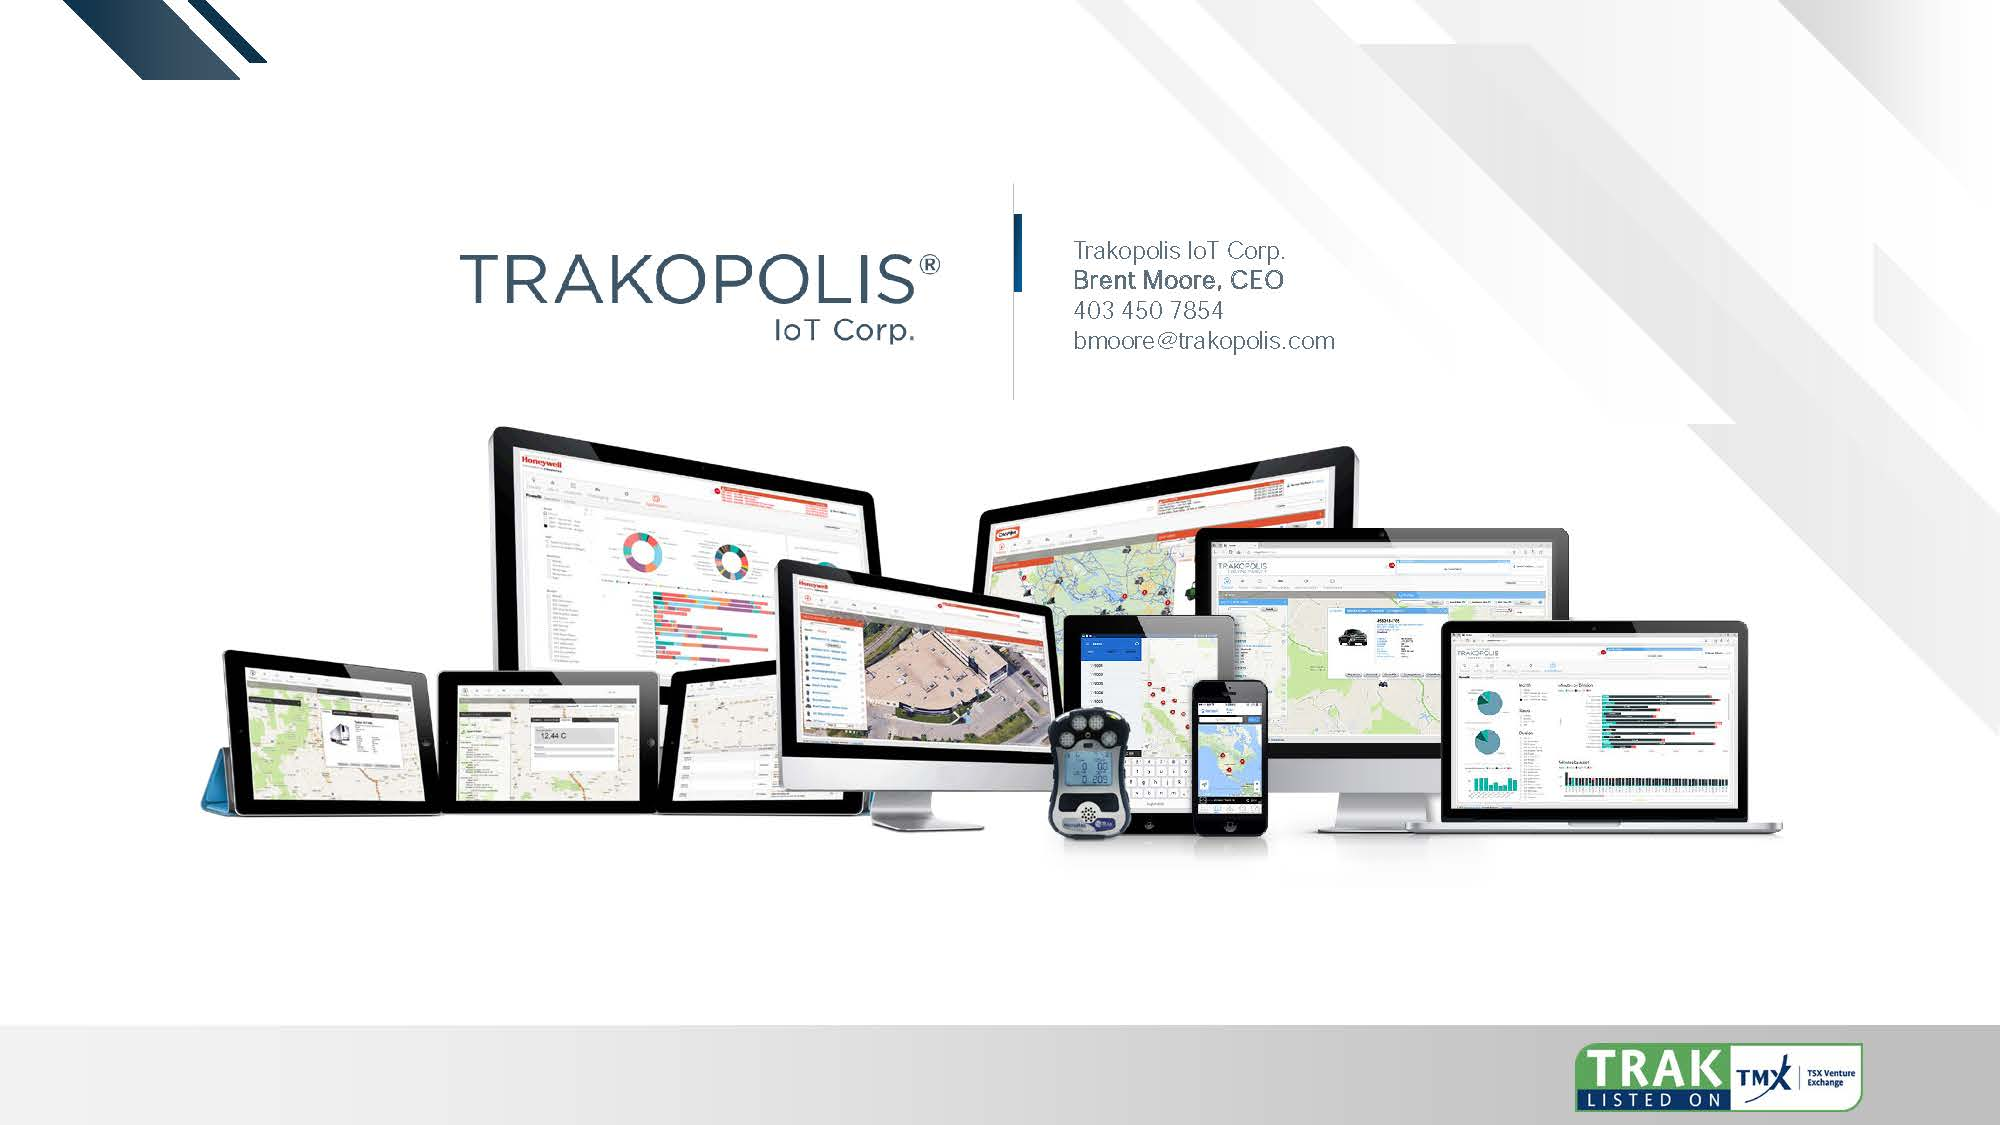 TRAK_CorporatePresentation_2019_Q1_web_Page_26.jpg